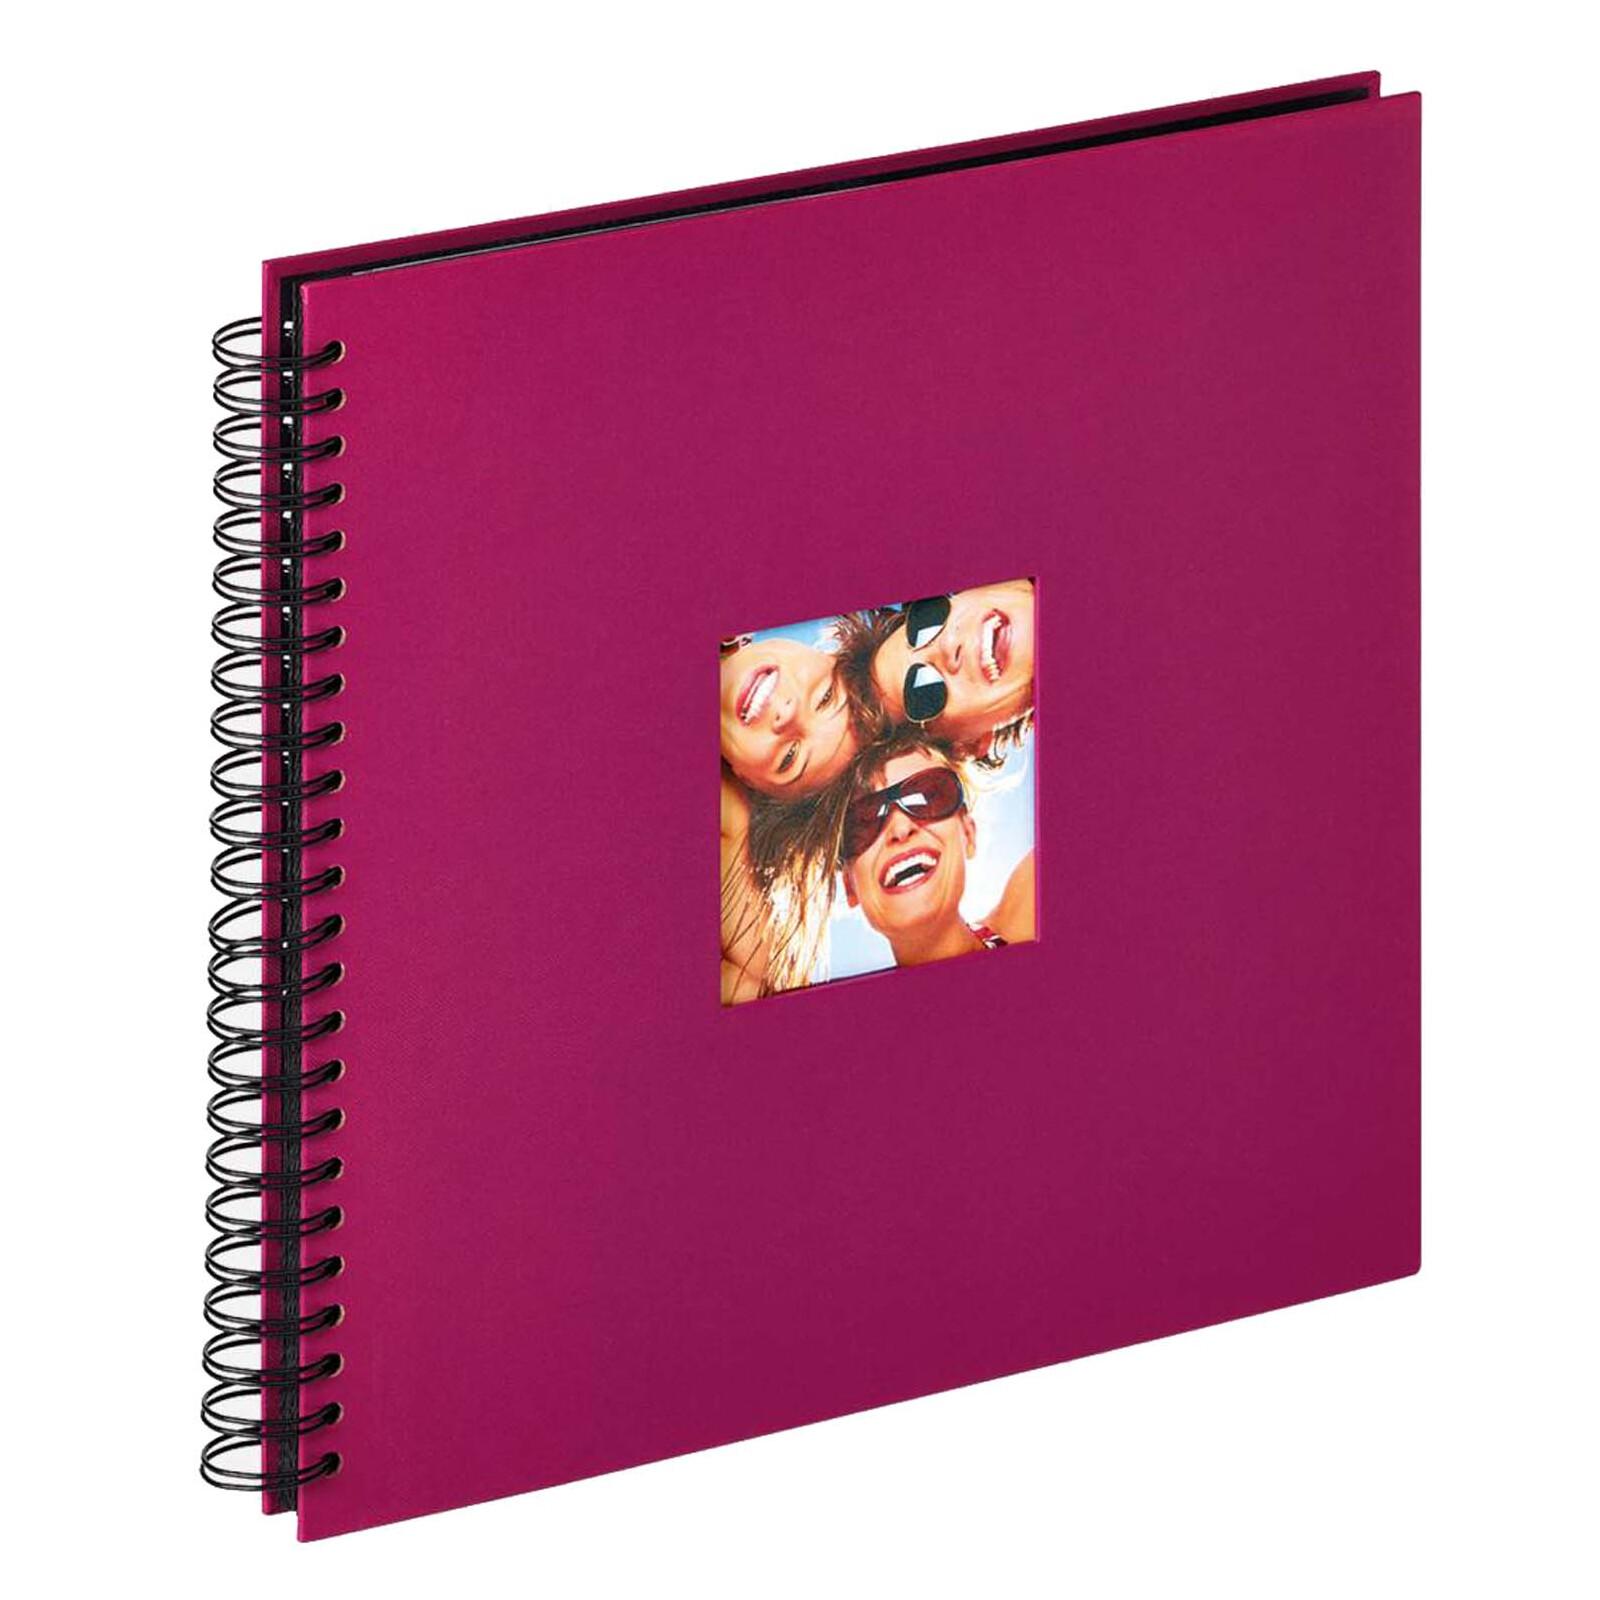 Album SA-110 30x30 50S Fun Violett